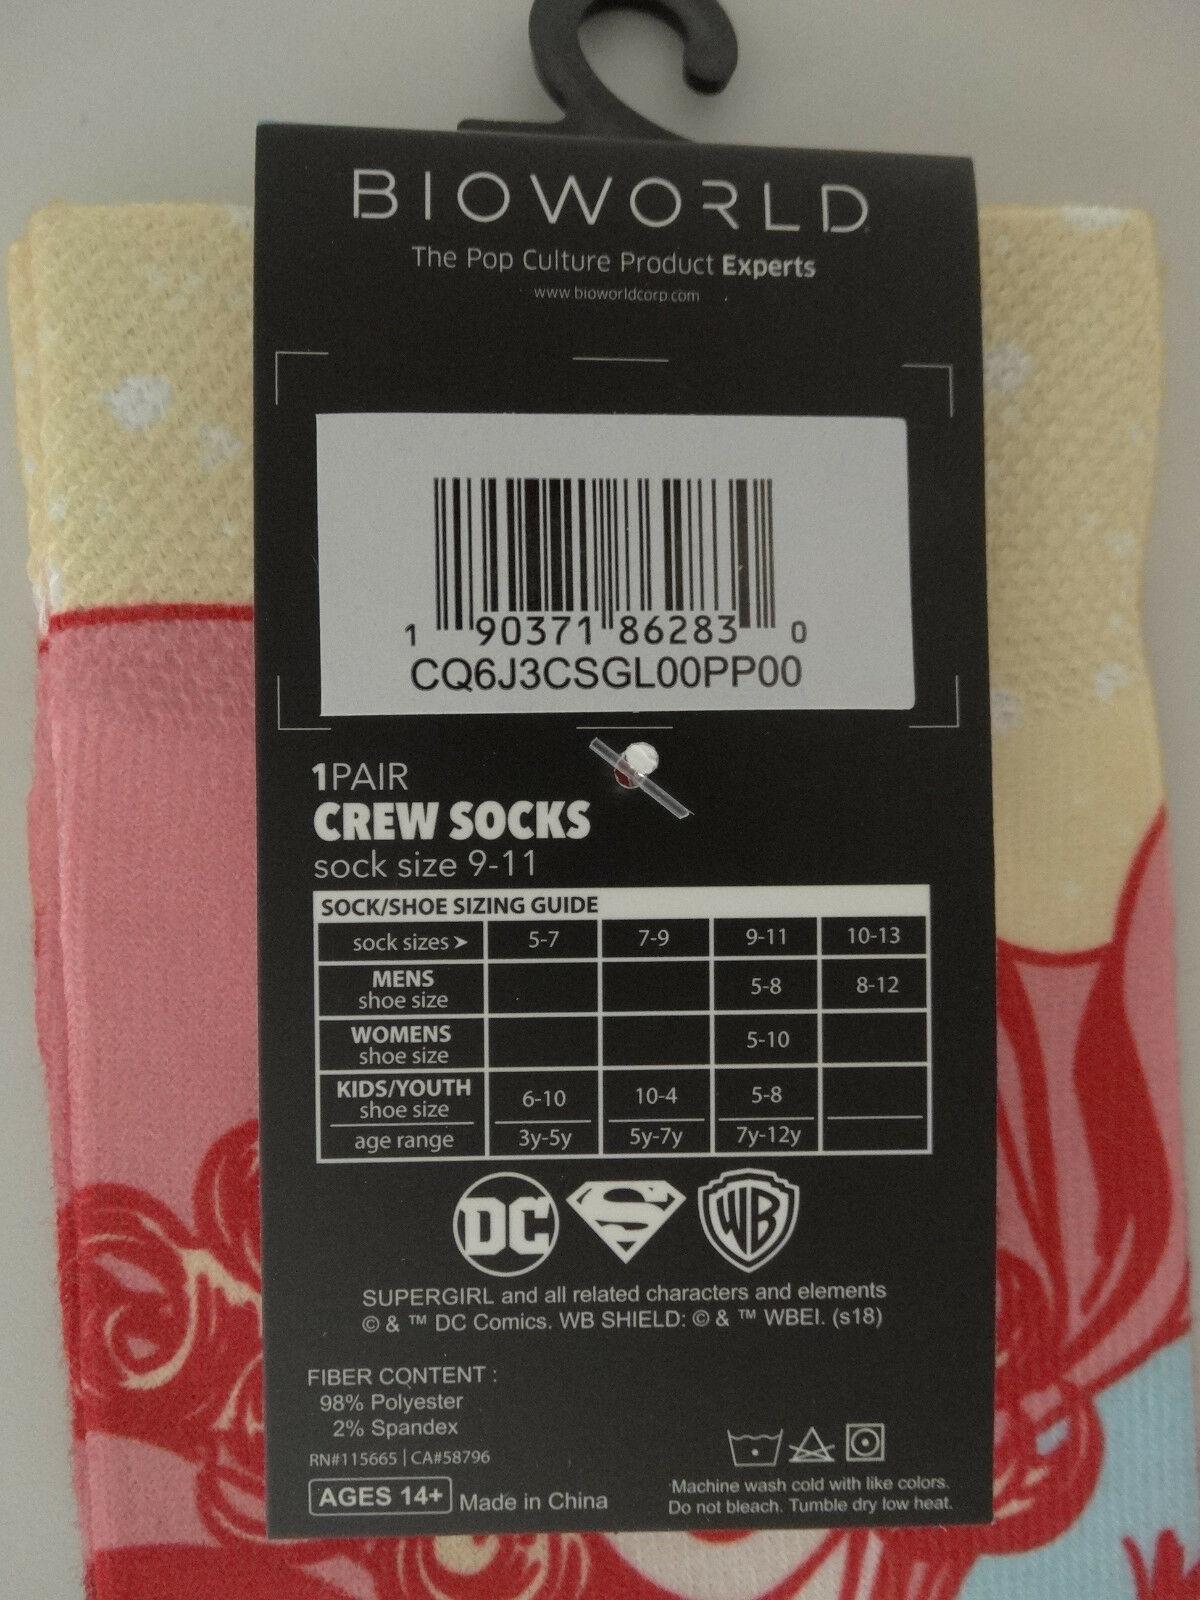 Supergirl Superman DC Comics Faded Neon Sublimated Adult Crew Socks